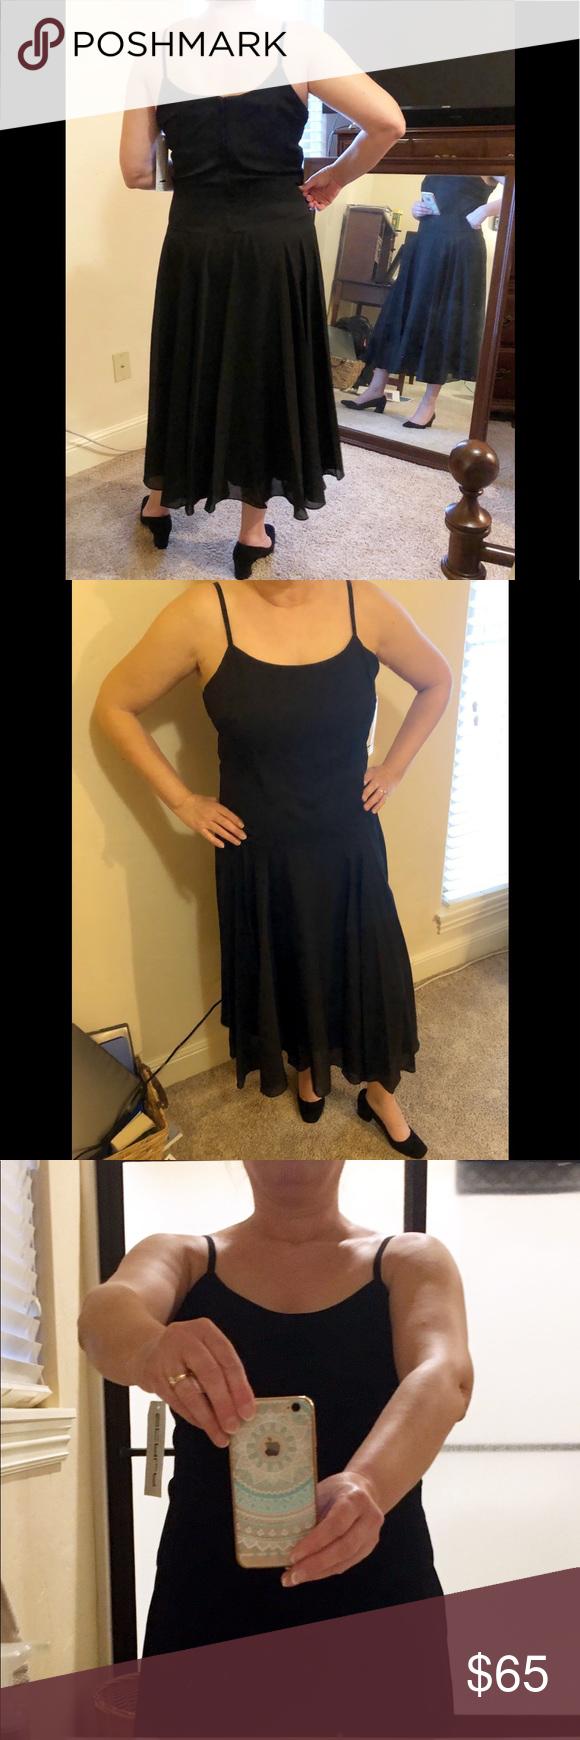 Scala Little Black Dress Coutoure Collection Xl Simple Elegant Lbd Tea Length Fully Lined Flowy Chiffon Skirt Ov Dresses Little Black Dress Colorful Dresses [ 1740 x 580 Pixel ]